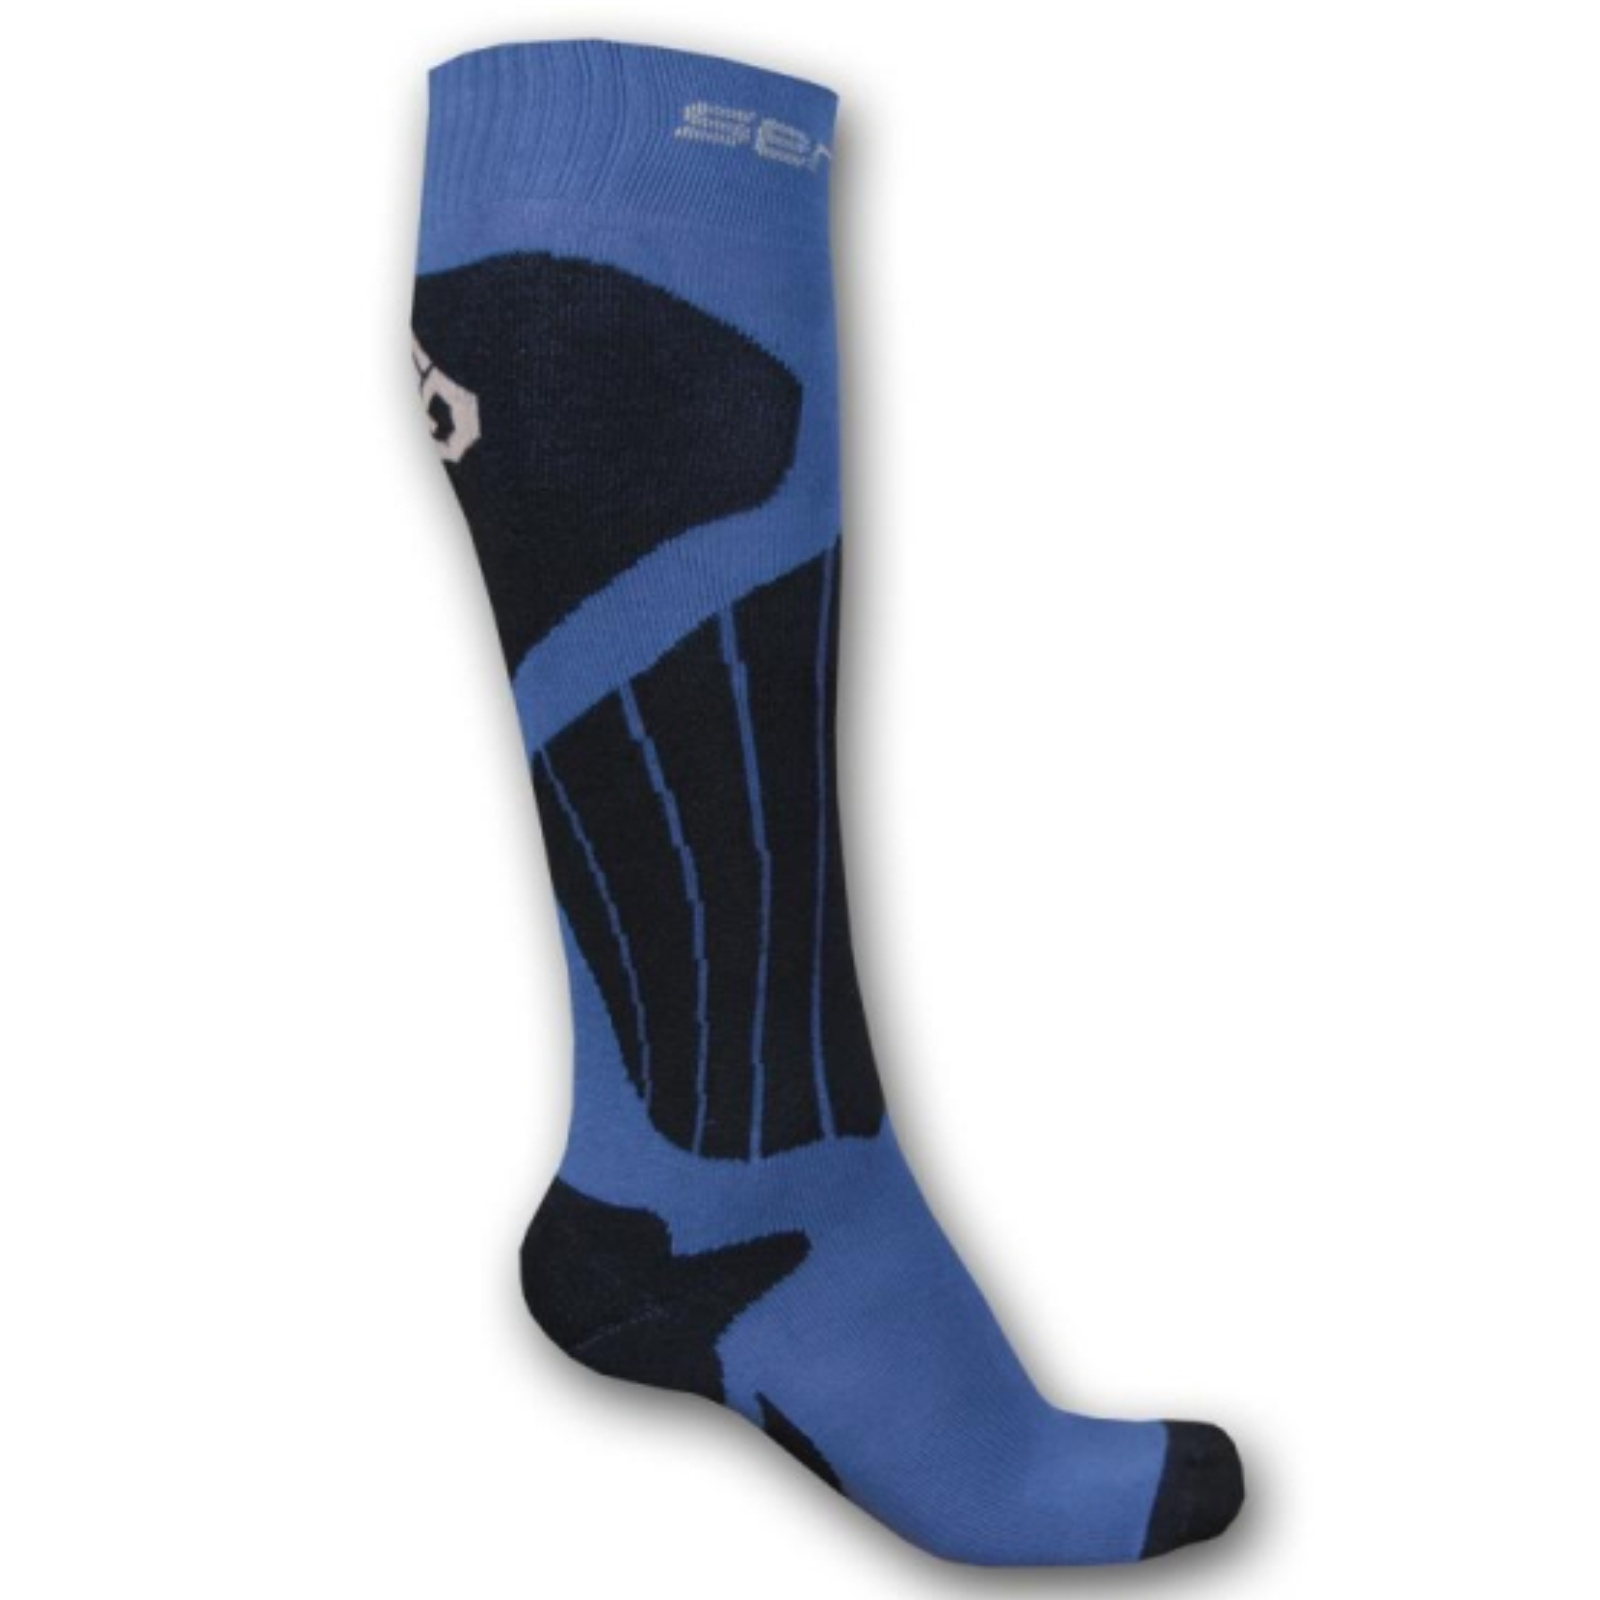 Ponožky SENSOR ThermoSnow modré vel. 6-8